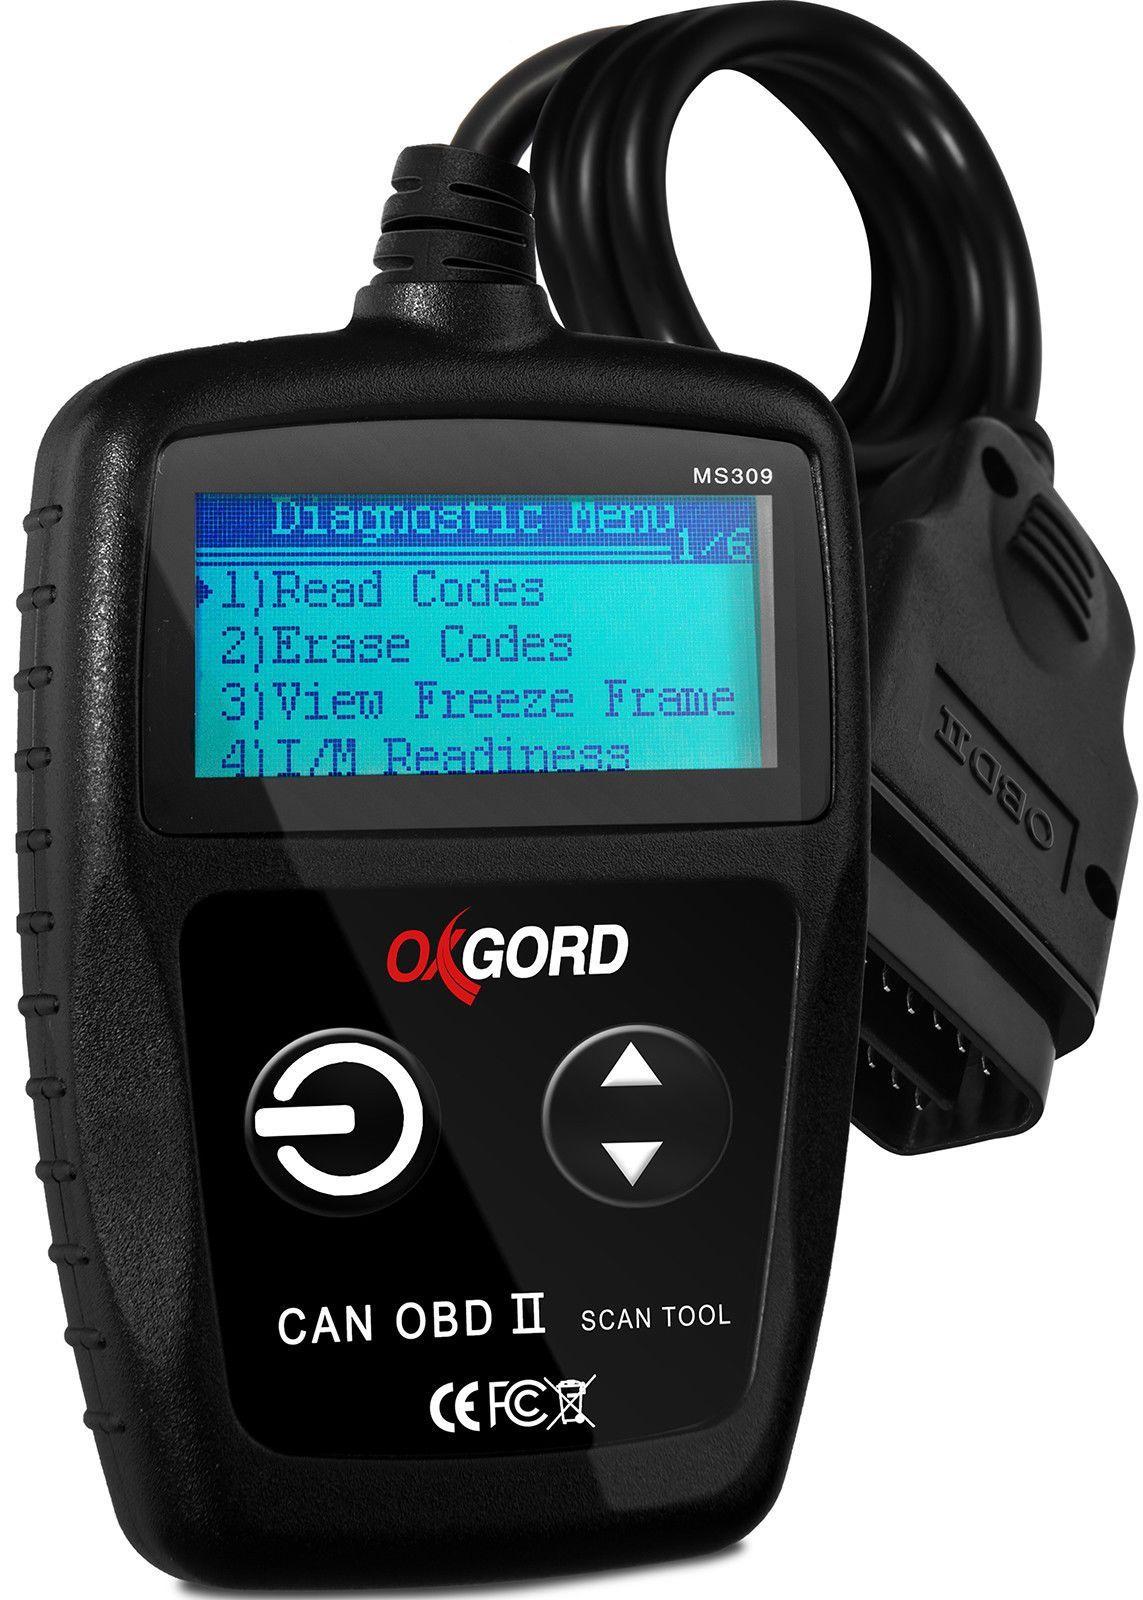 OBDII Scanner Code Reader CAN OxGord MS309 OBD2 Scan Tool